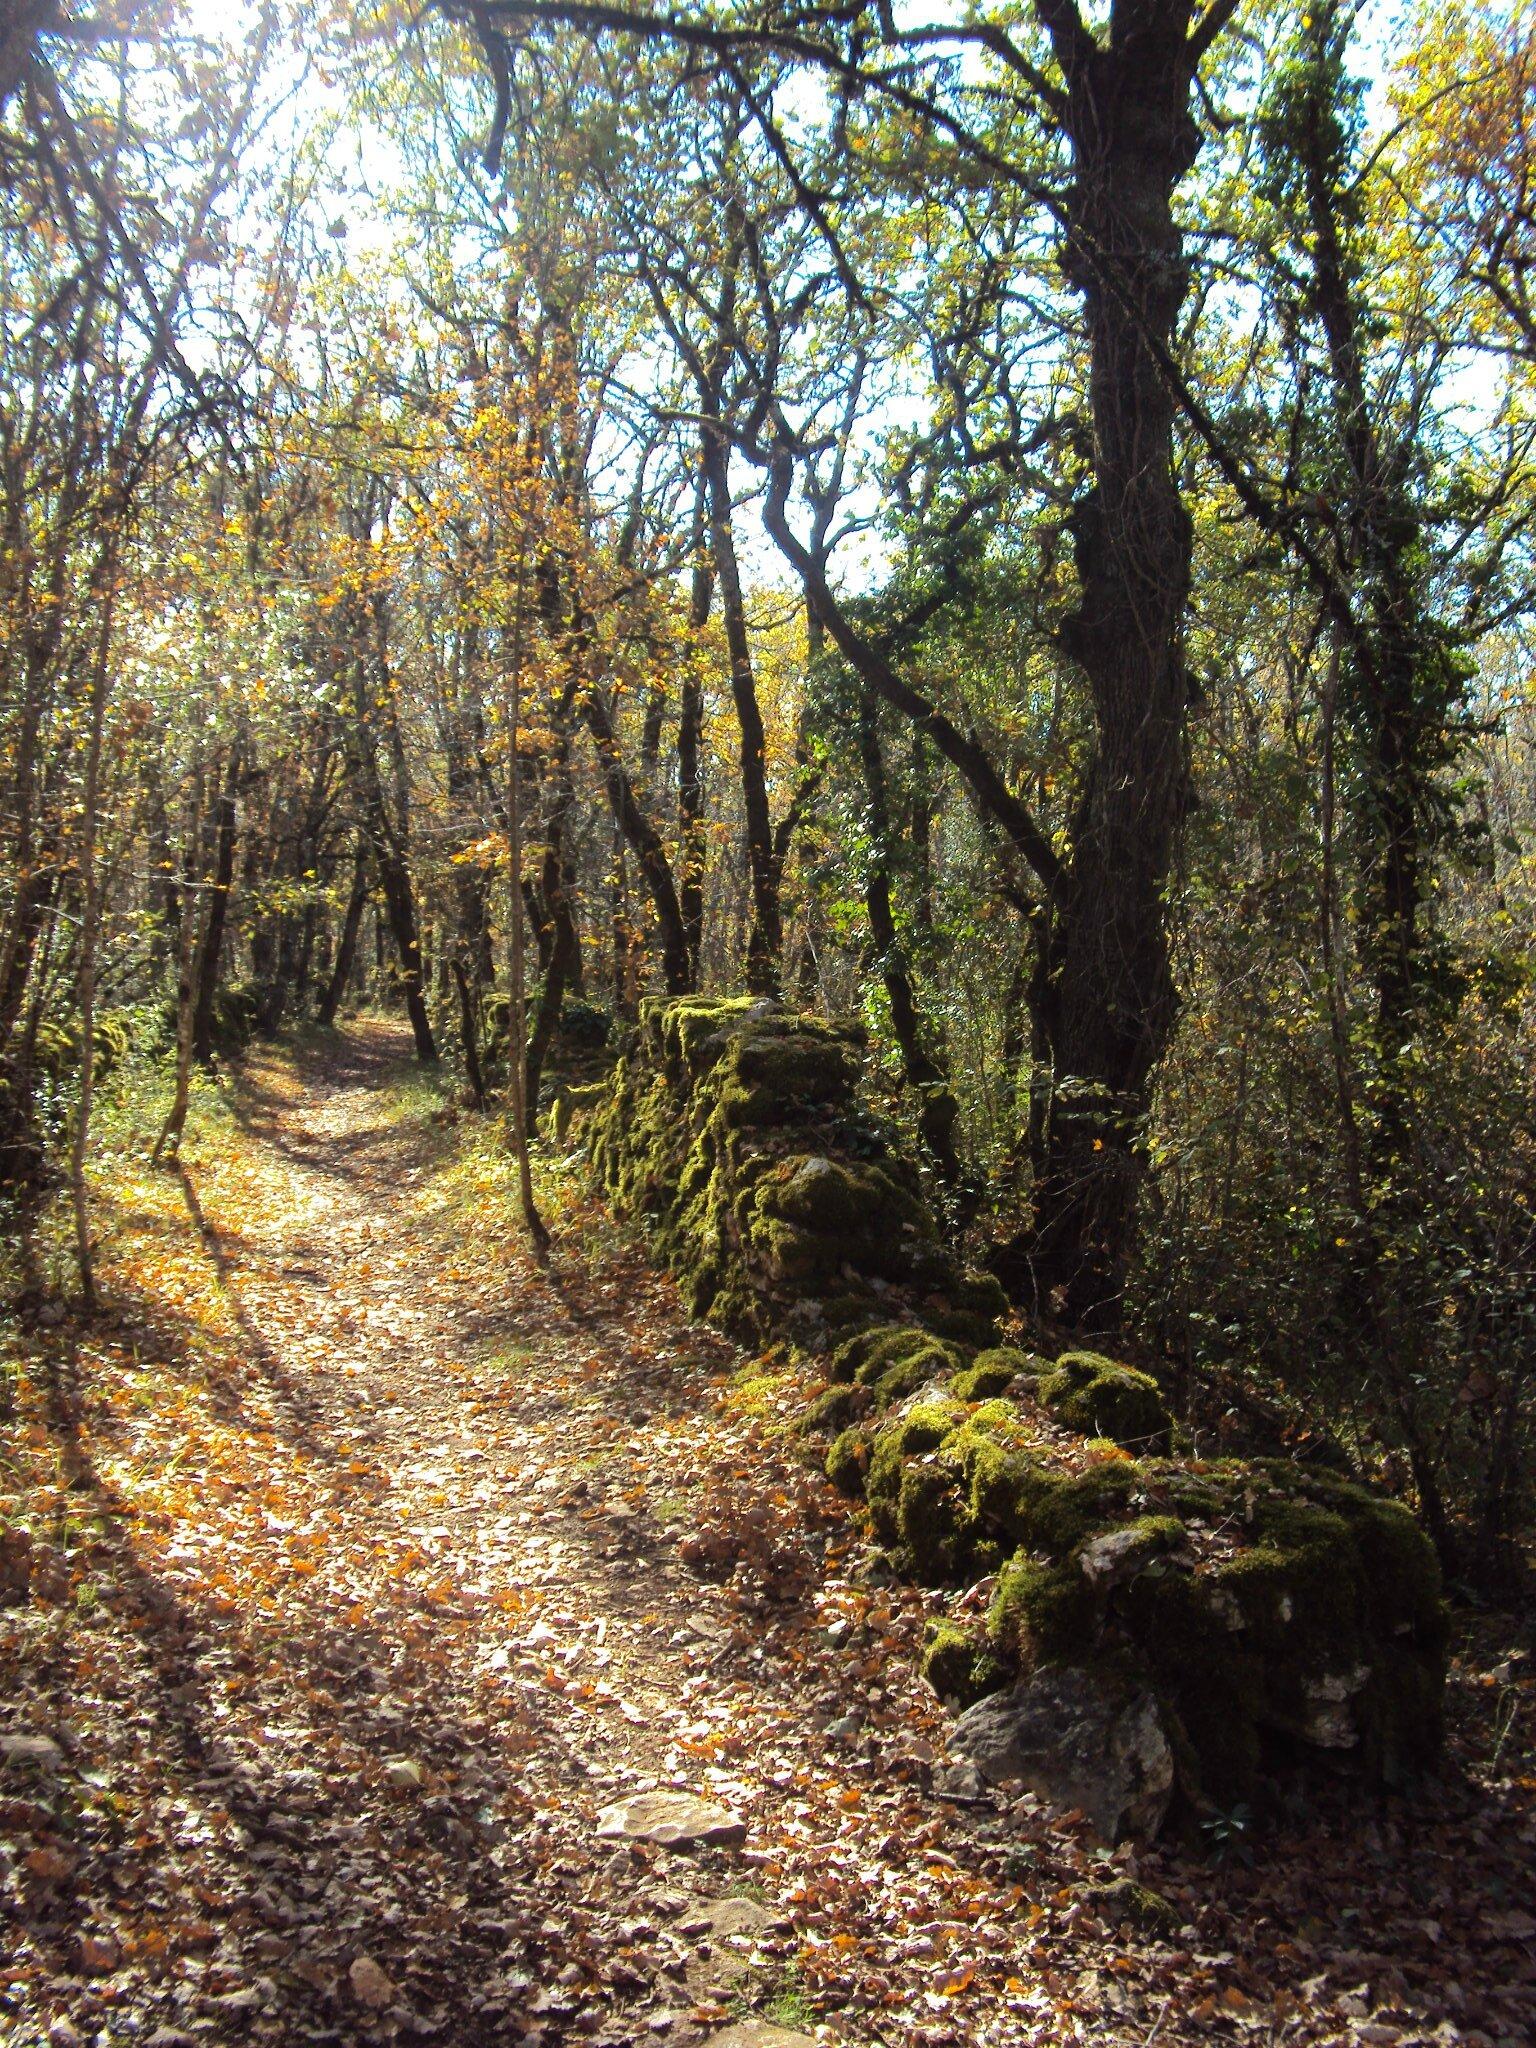 week-end randonnée à saint-antonin-noble-val (tarn-et-garonne